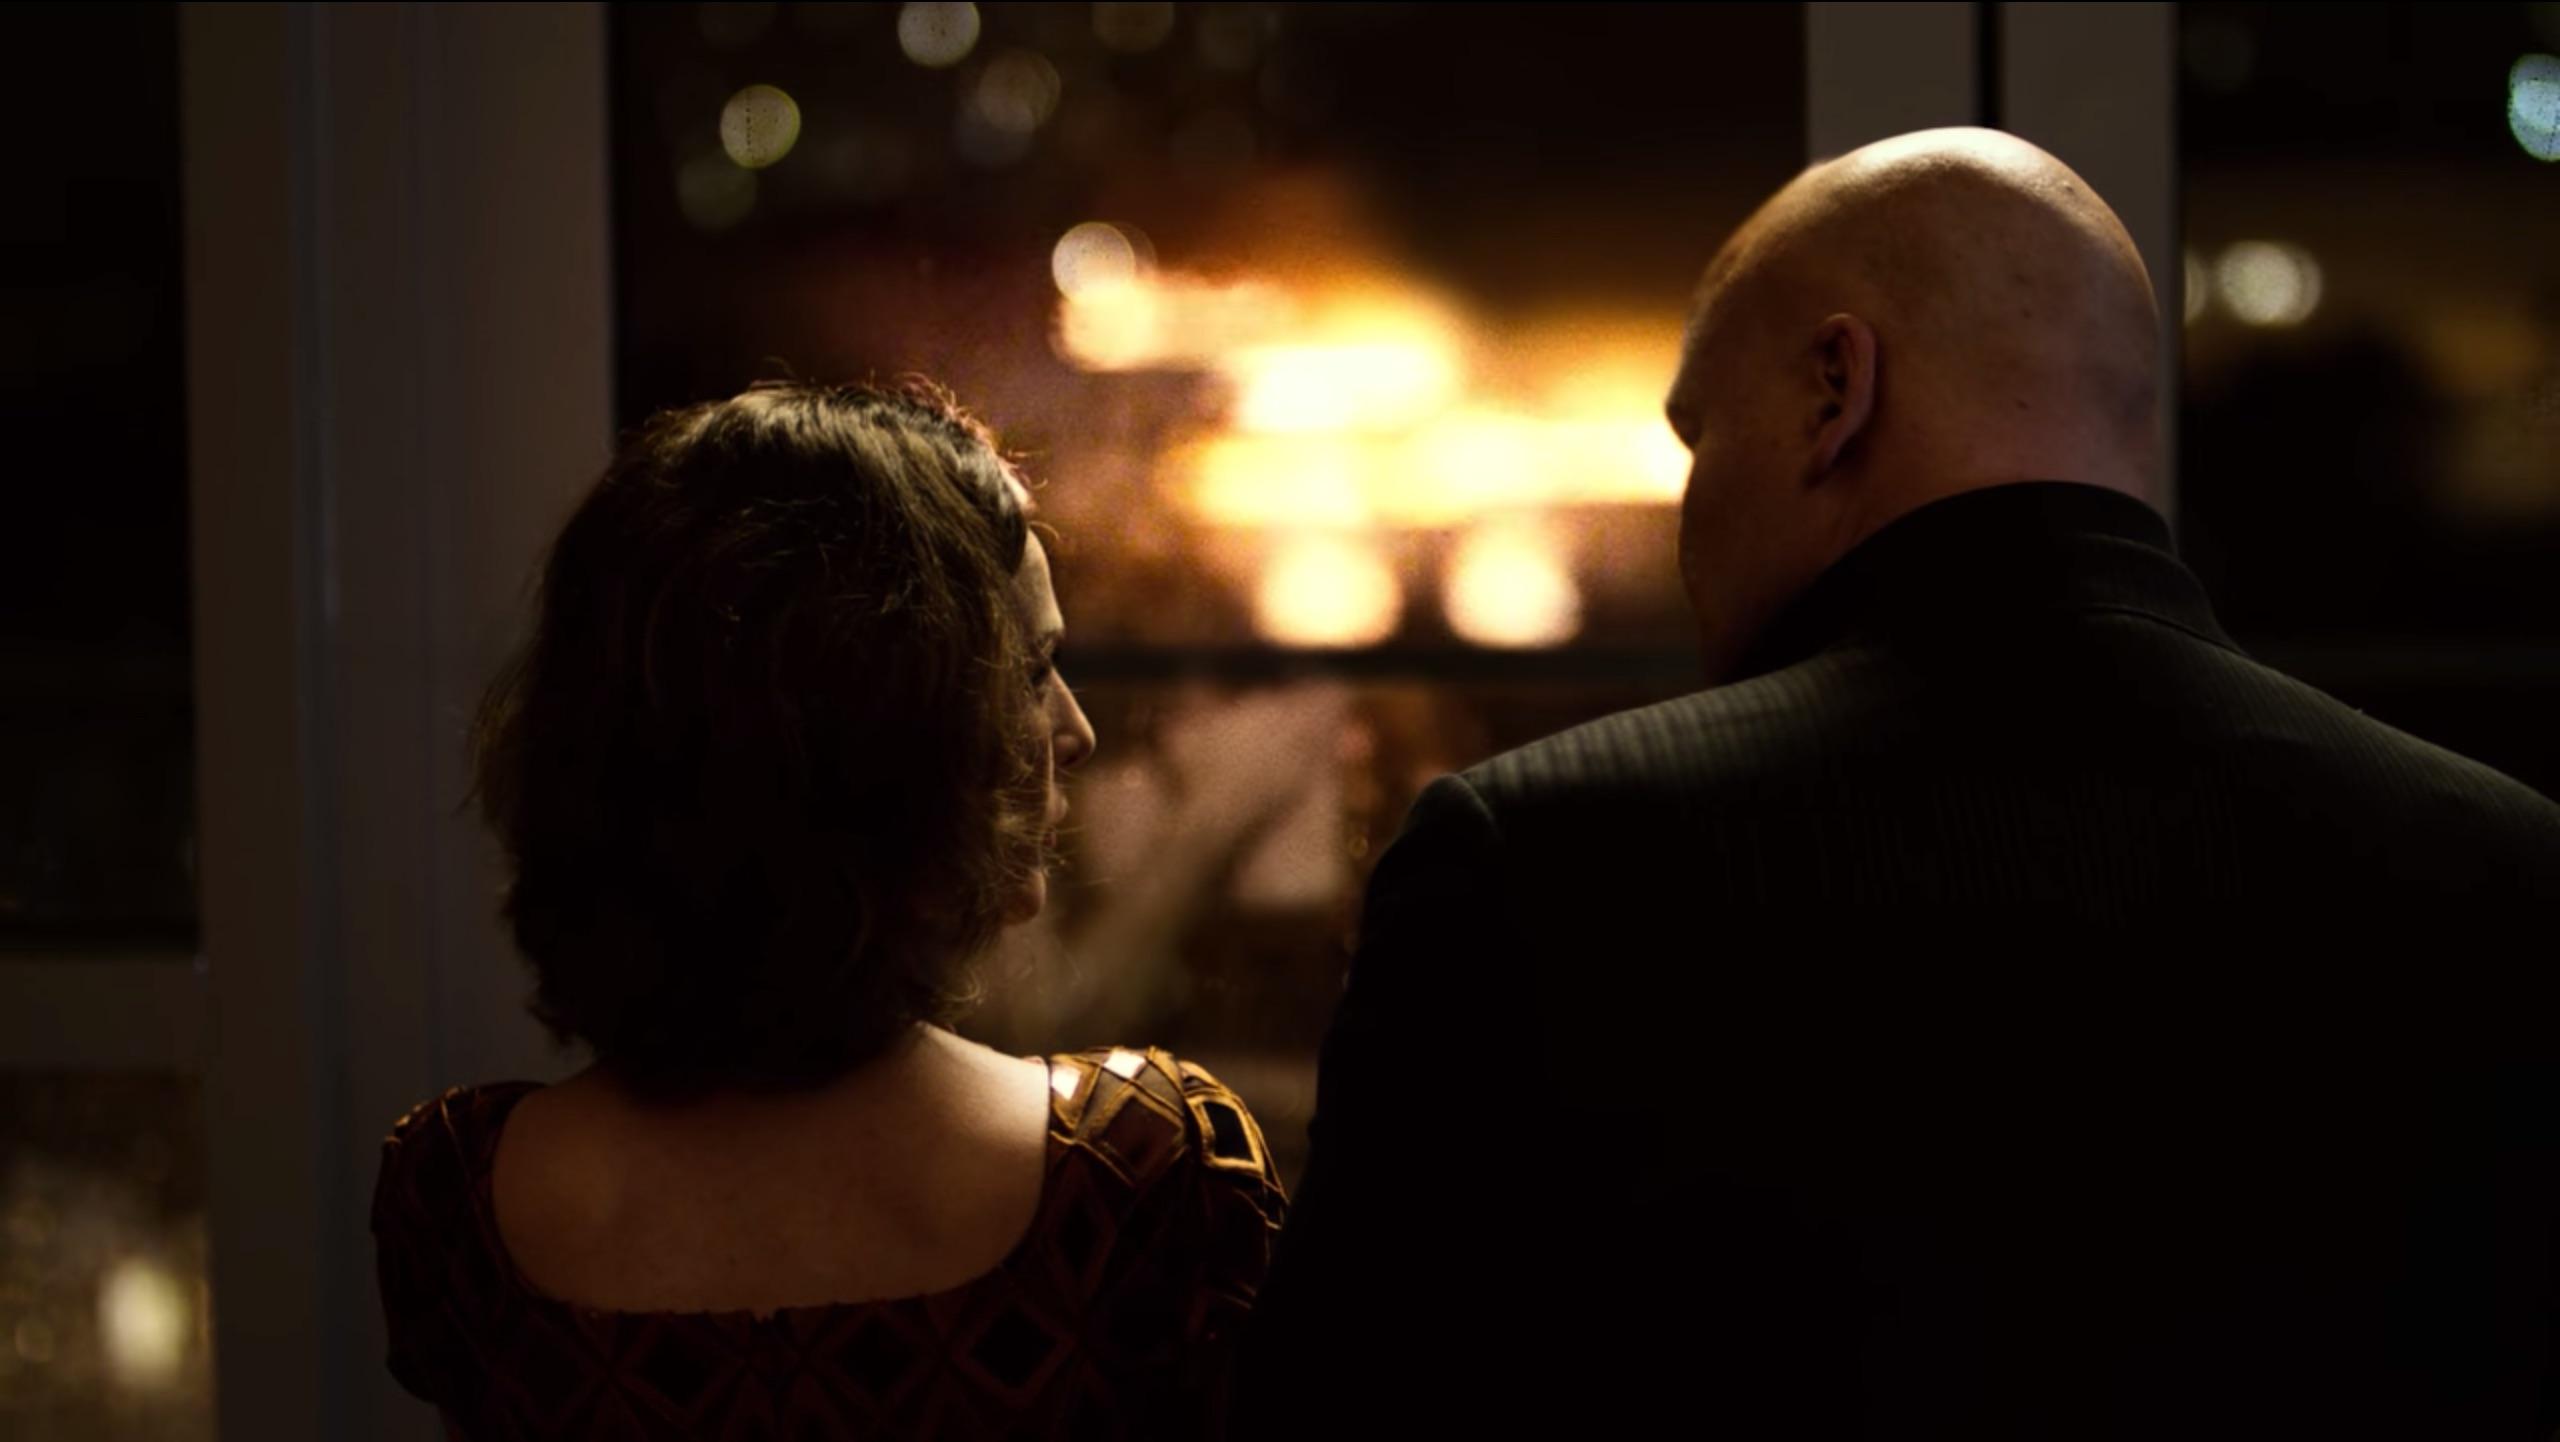 File:Vincent-DOnofrio-and-Ayelet-Zurer-in-Daredevil-Season-1.jpg